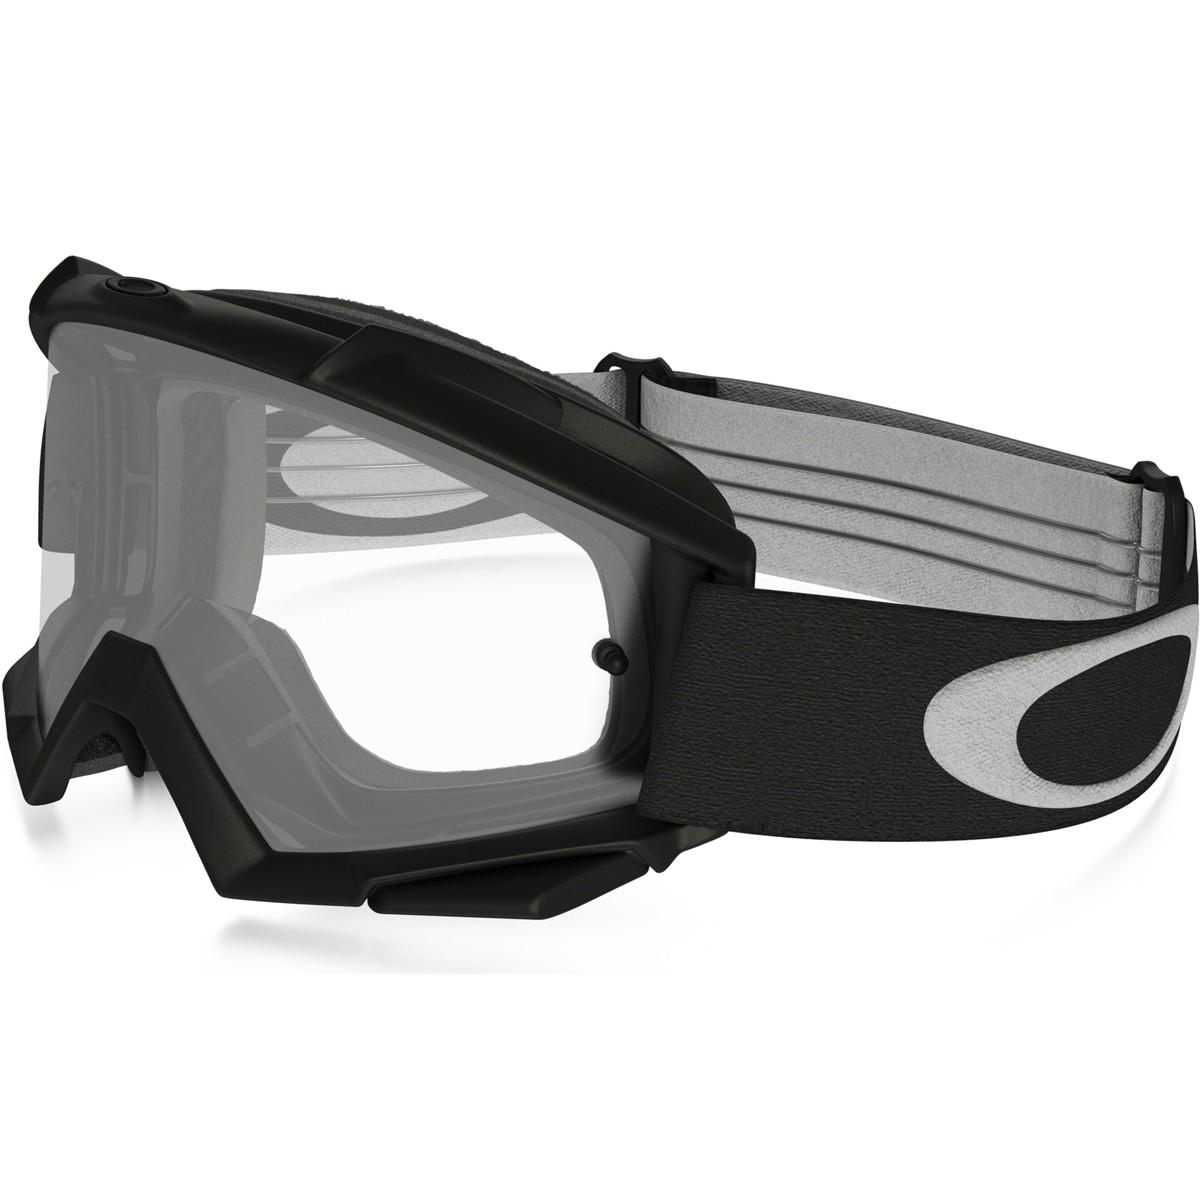 0f9011d5cfd25 Óculos Goggle Oakley Proven MX Matte Black Lente Clear ref 01-718